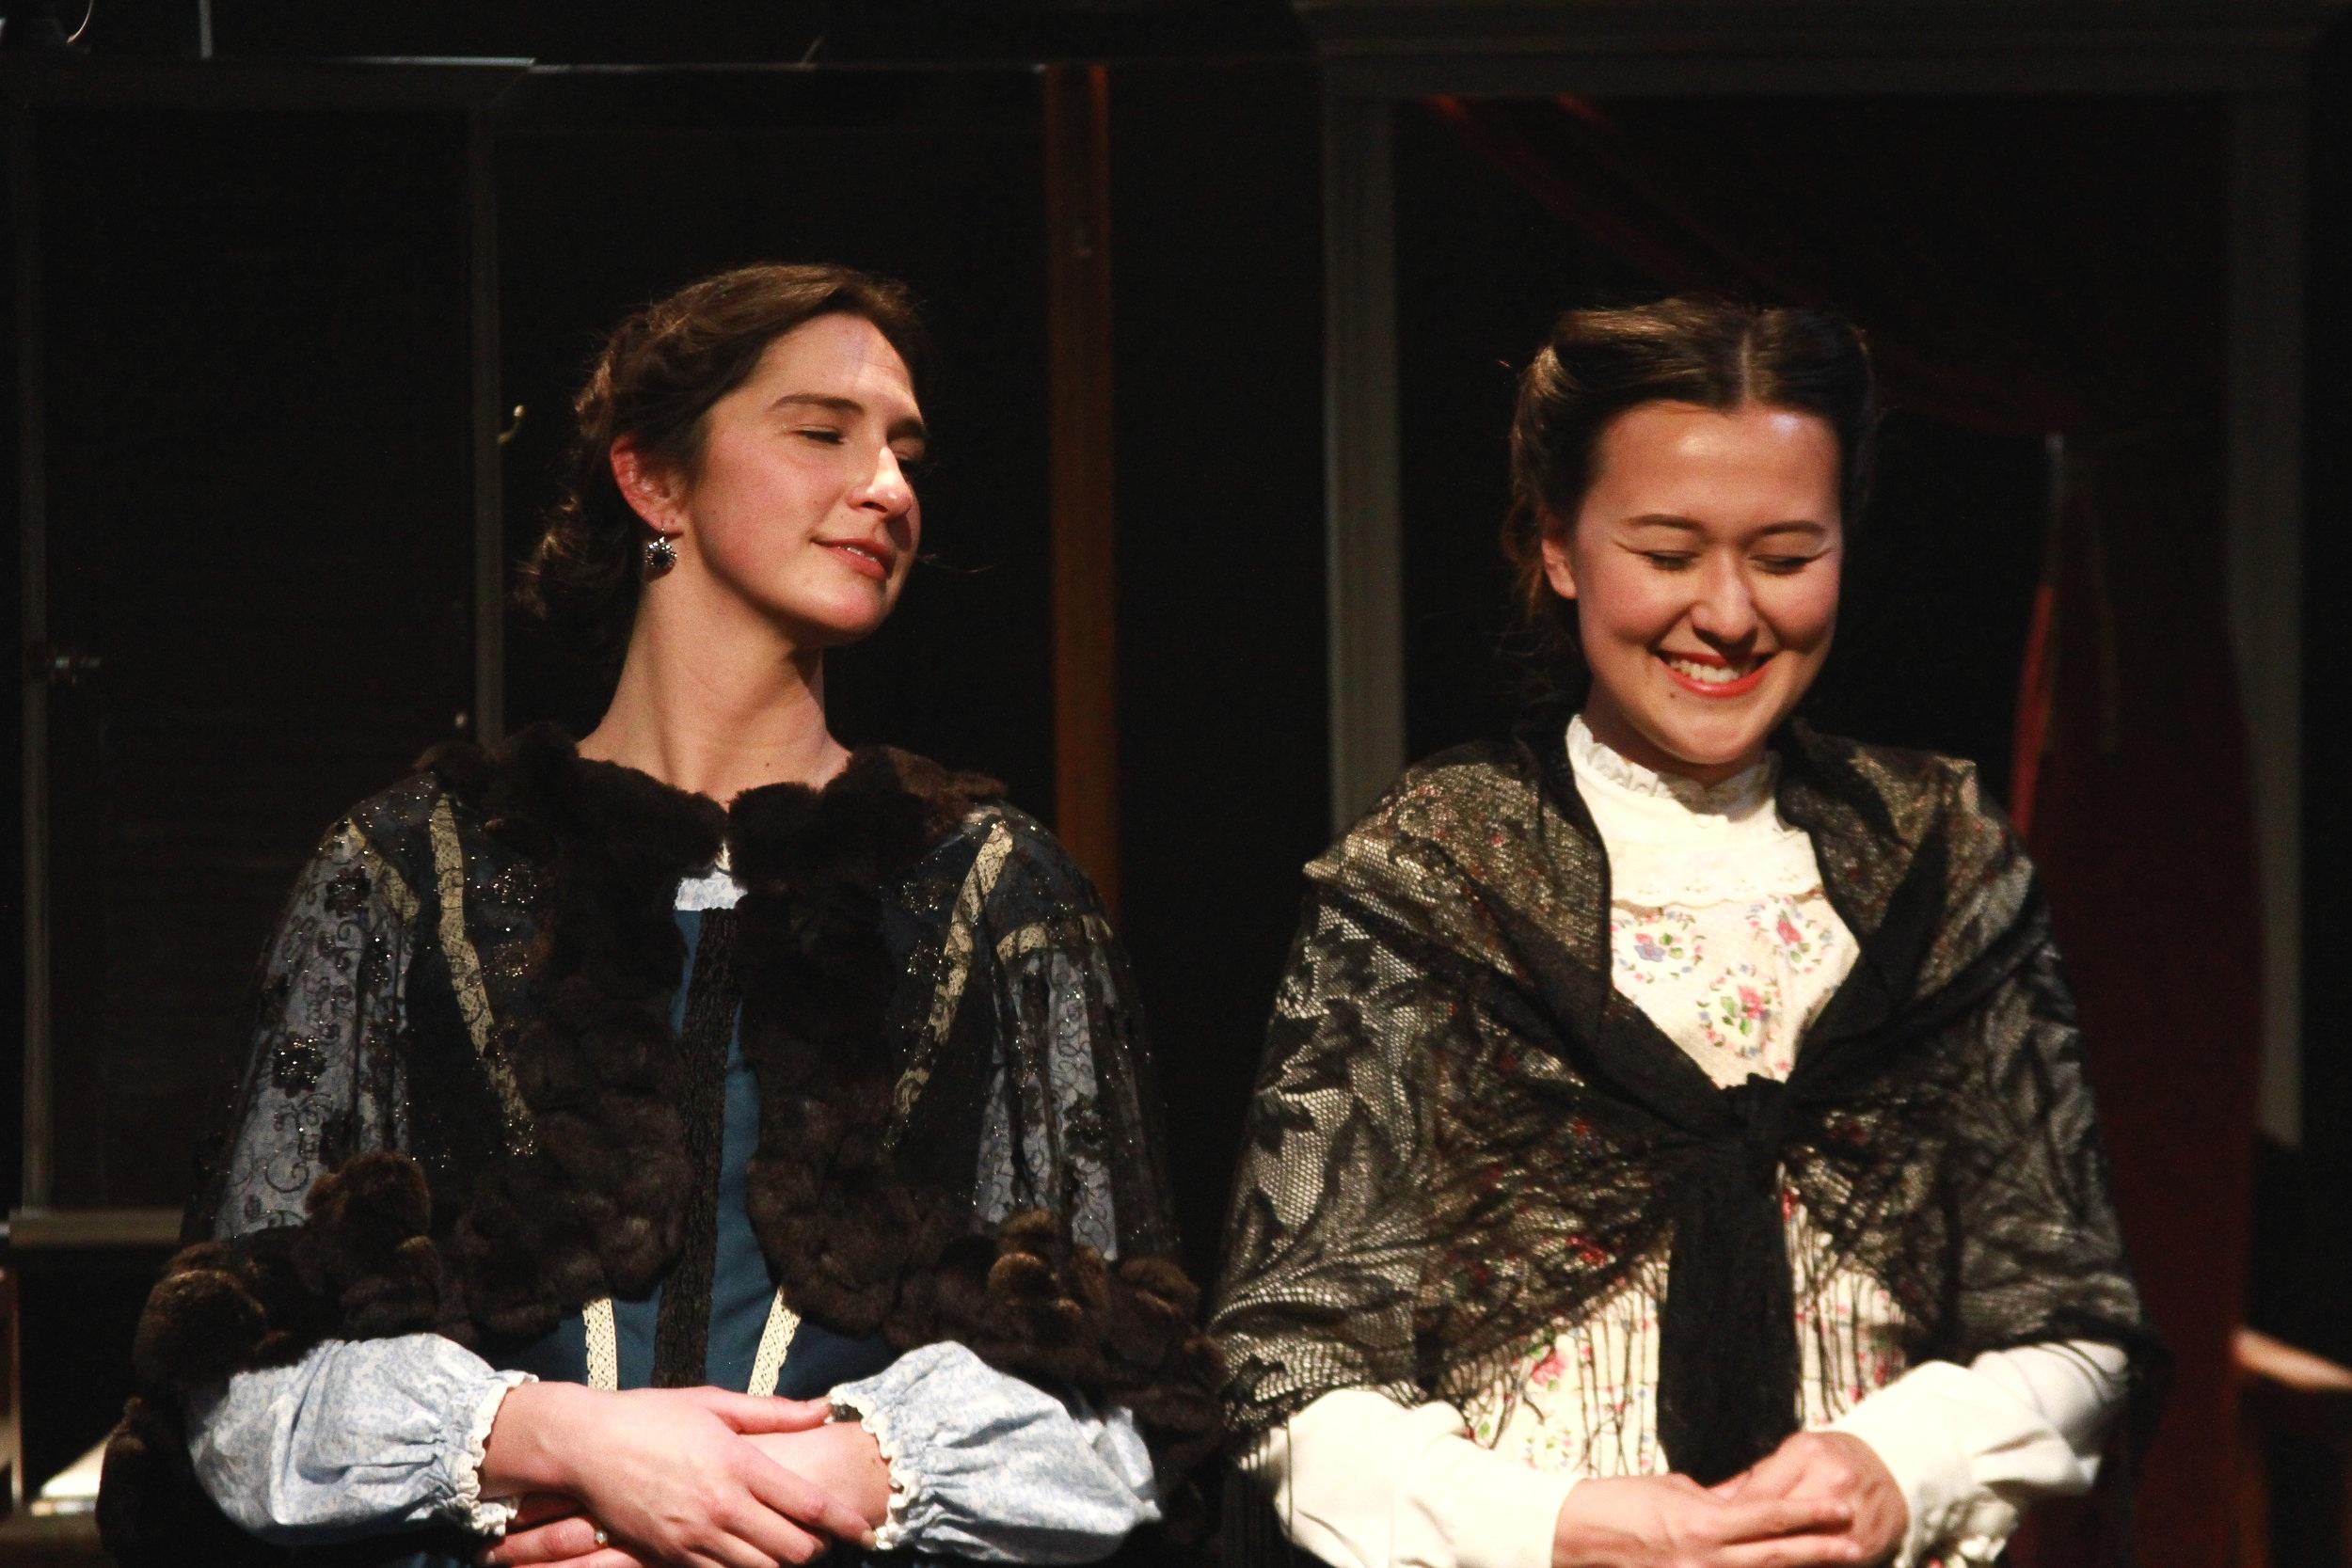 Jessica O'Hara-Baker (Ann) and Emily Gardner Xu Hall (Caroline)